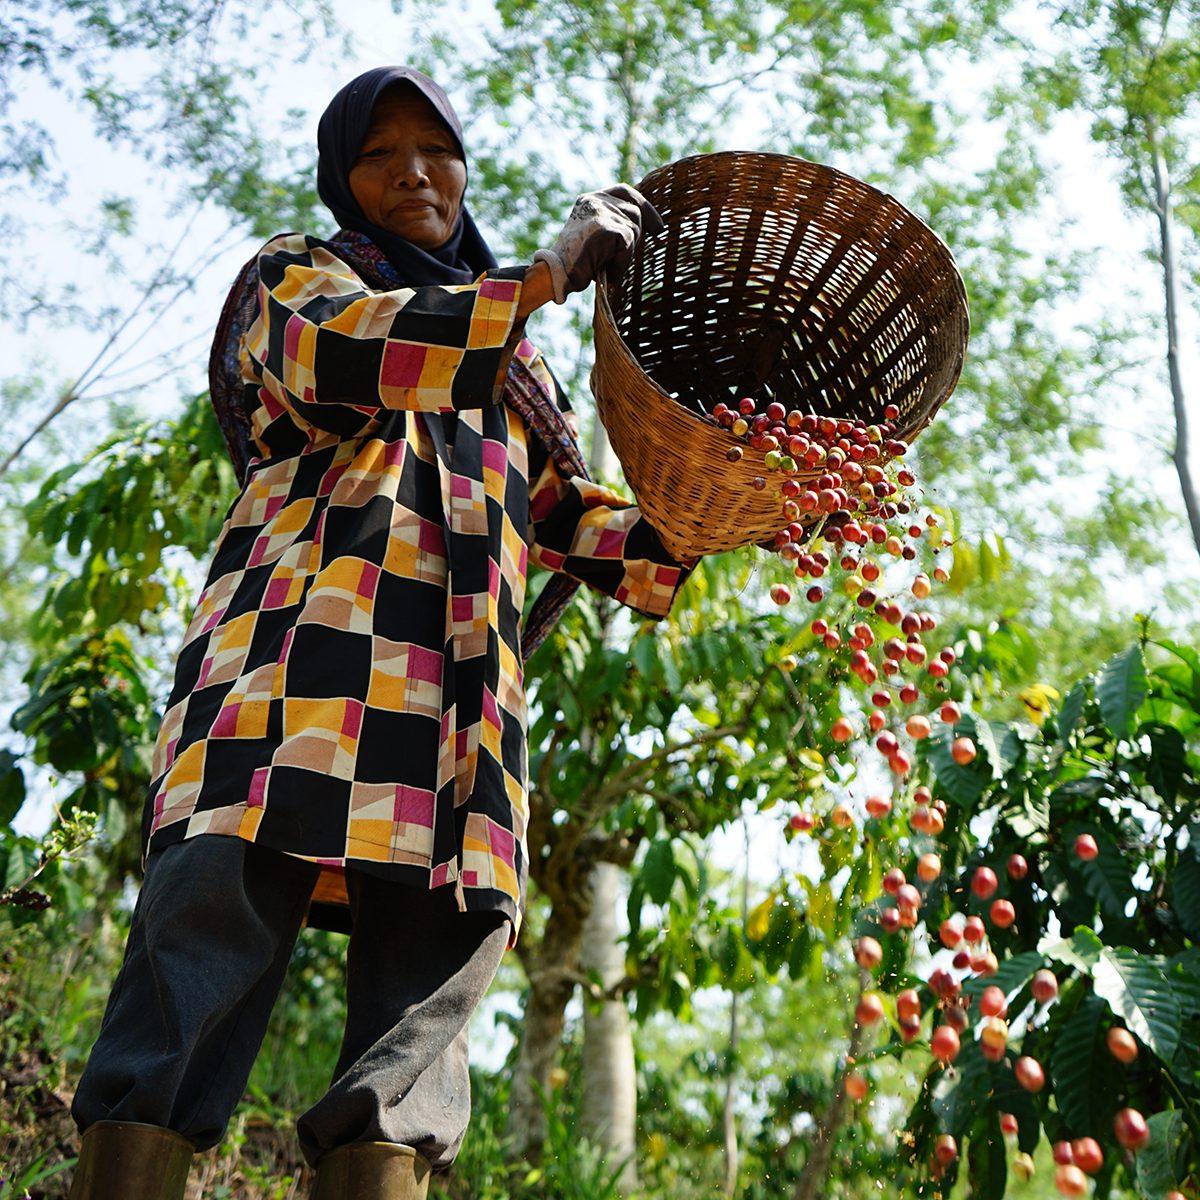 Banaran Coffee Village near the city of Semarang in Central Java, Indonesia,